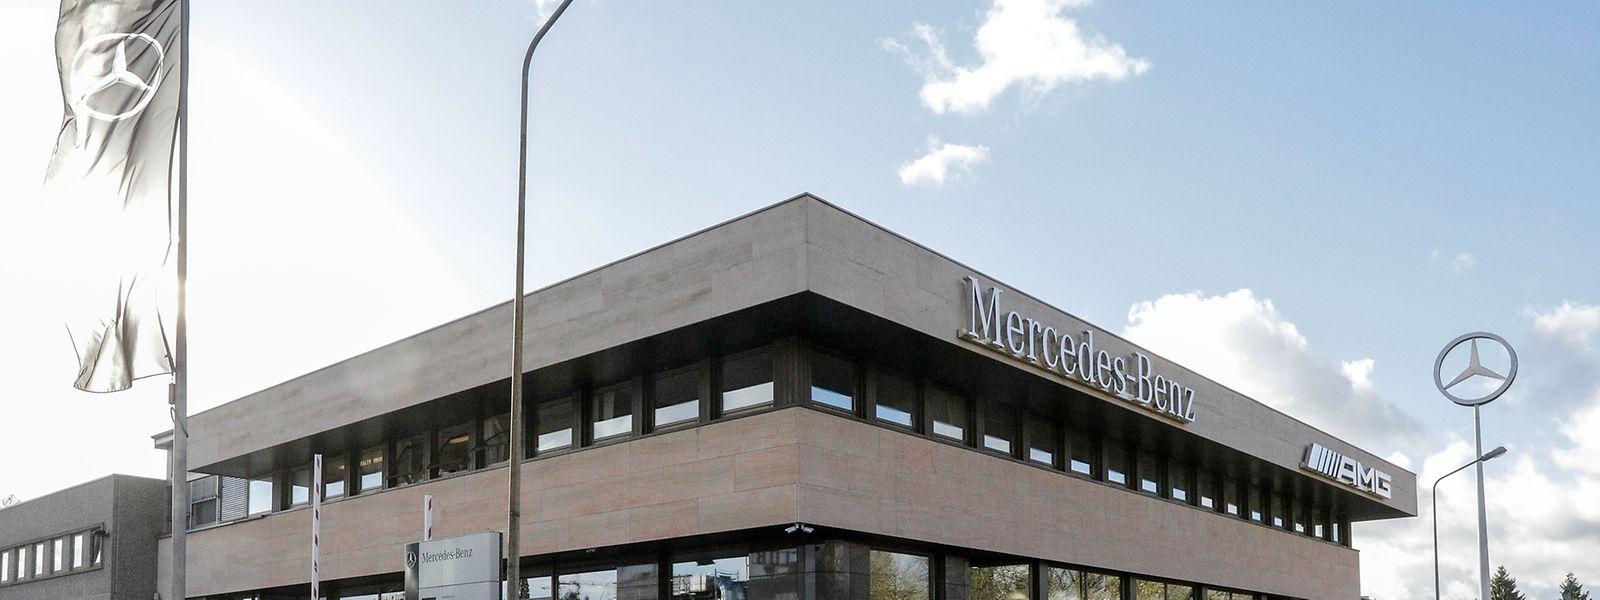 mercedes-benz luxembourg s.a.: werksniederlassung abzugeben